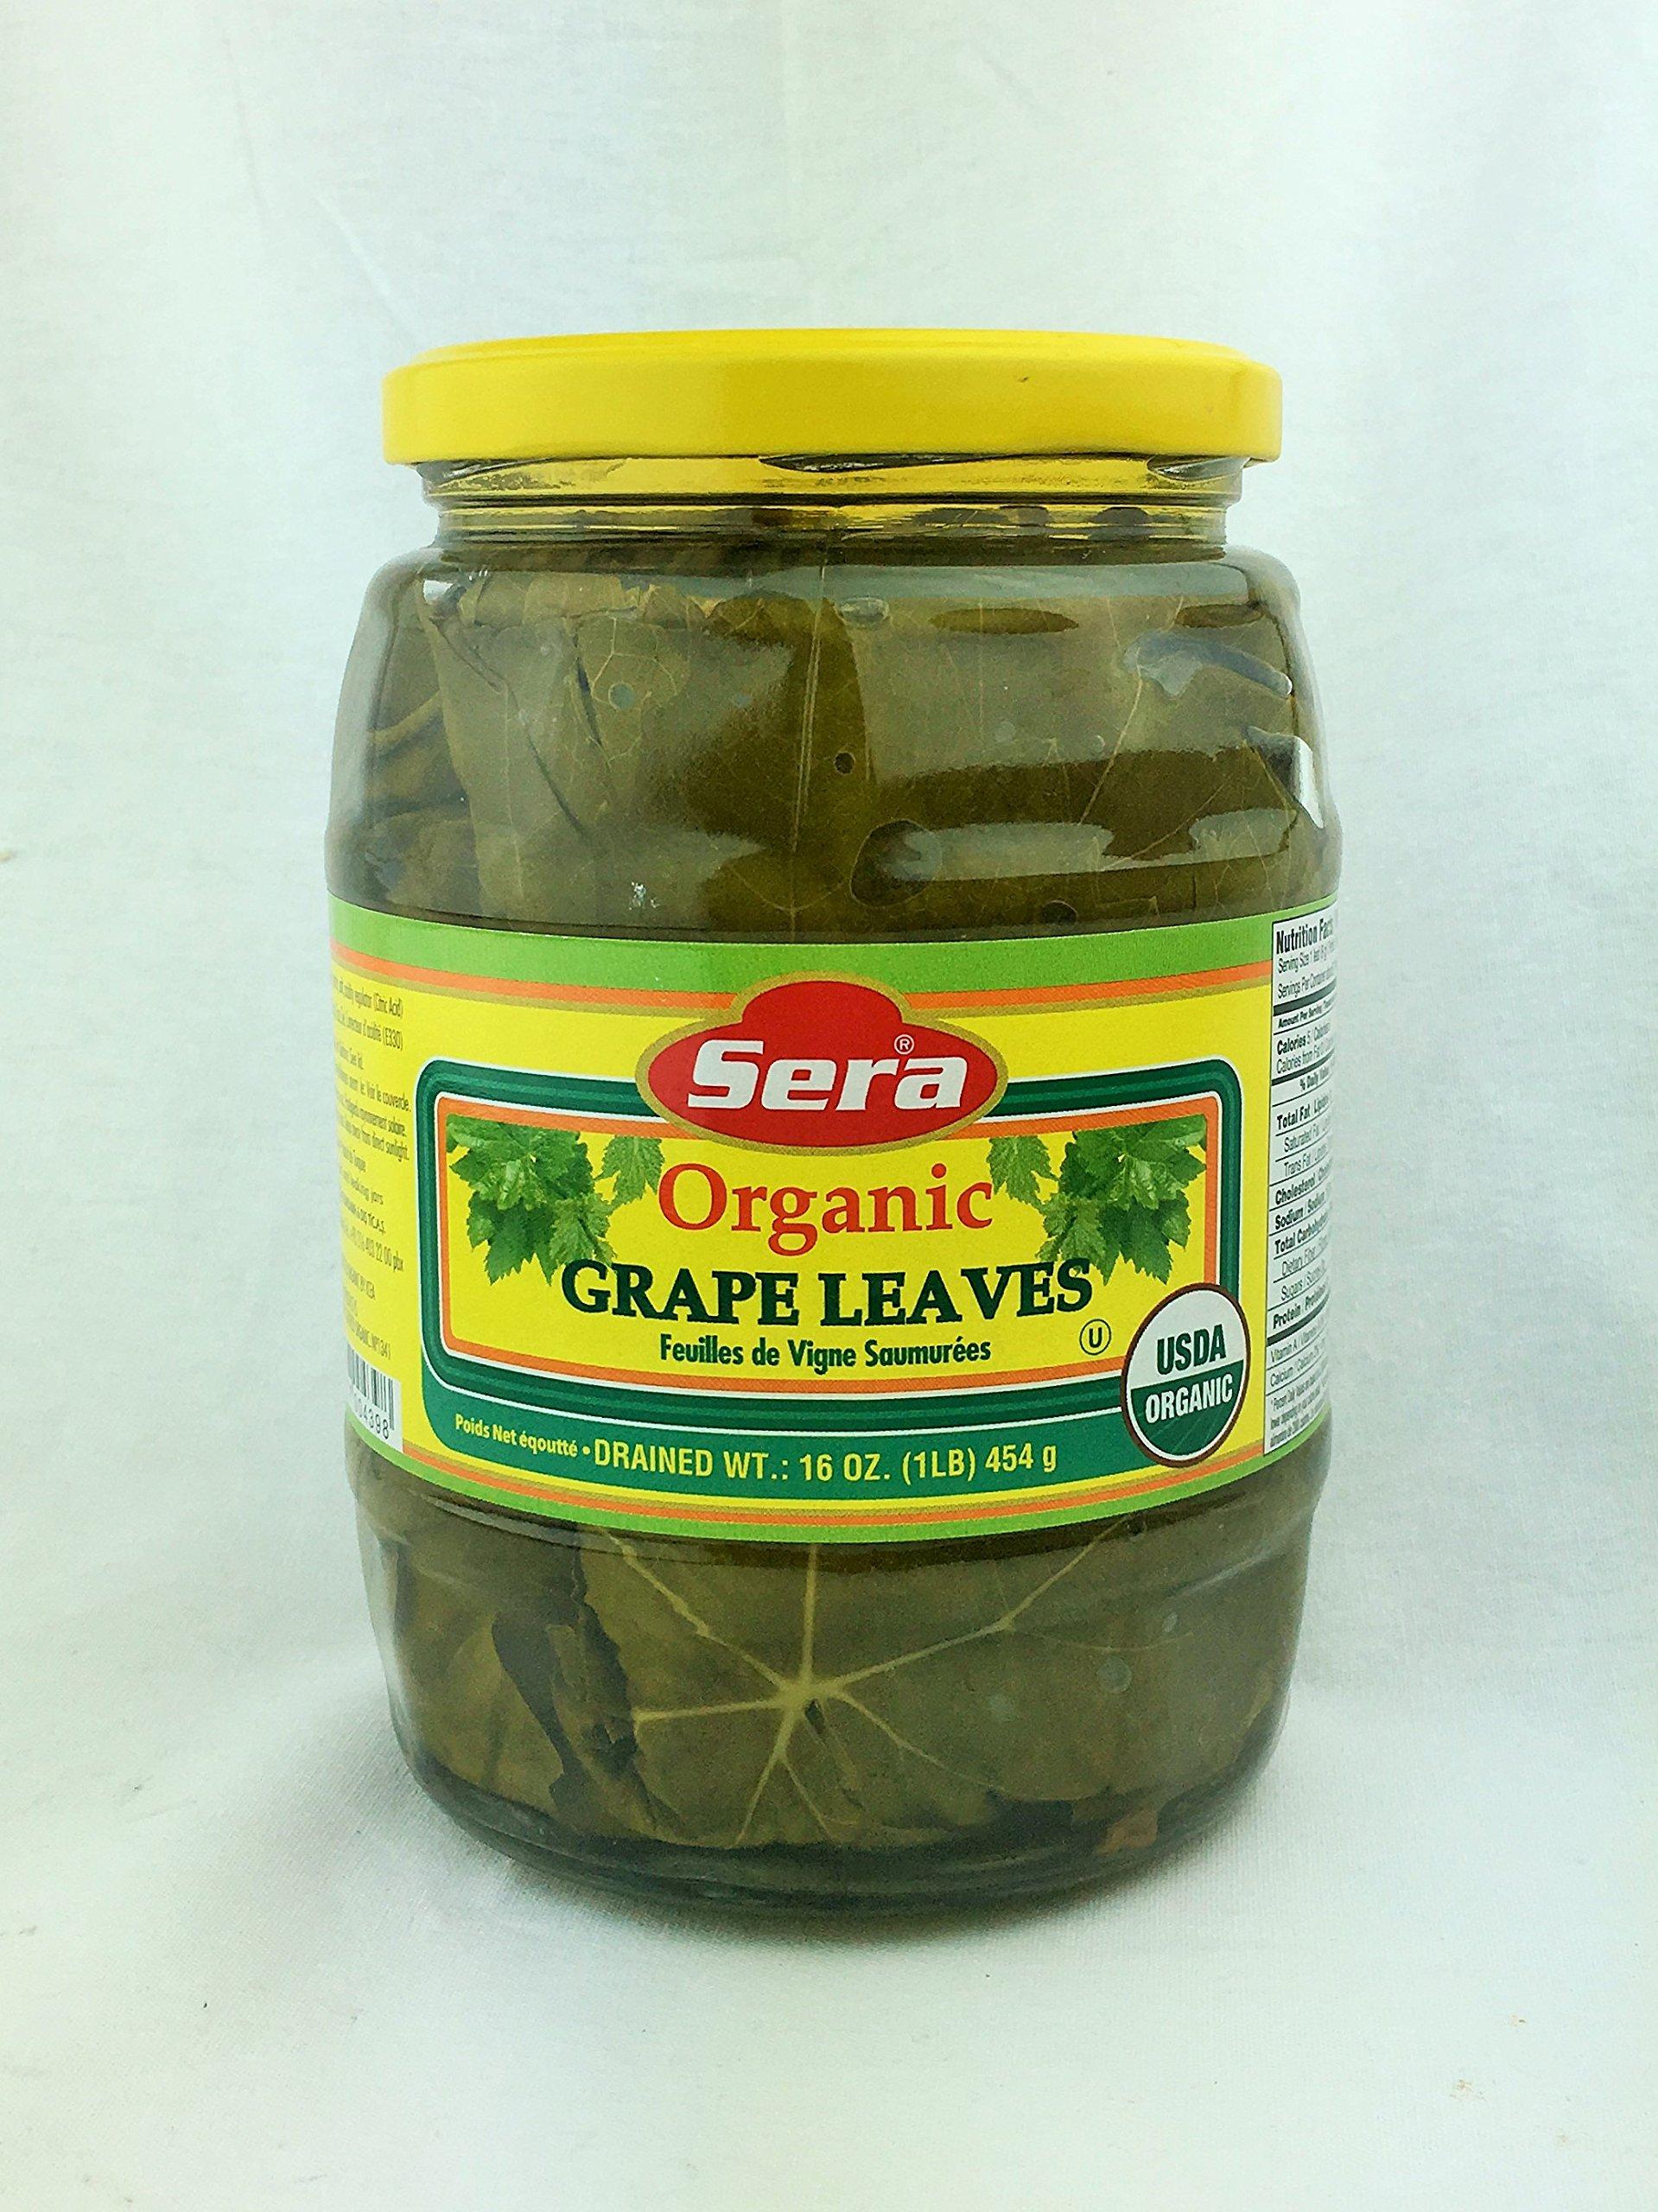 Sera Organic Grape Leaves for Stuffing Turkish 1 Lb / 454 Gr